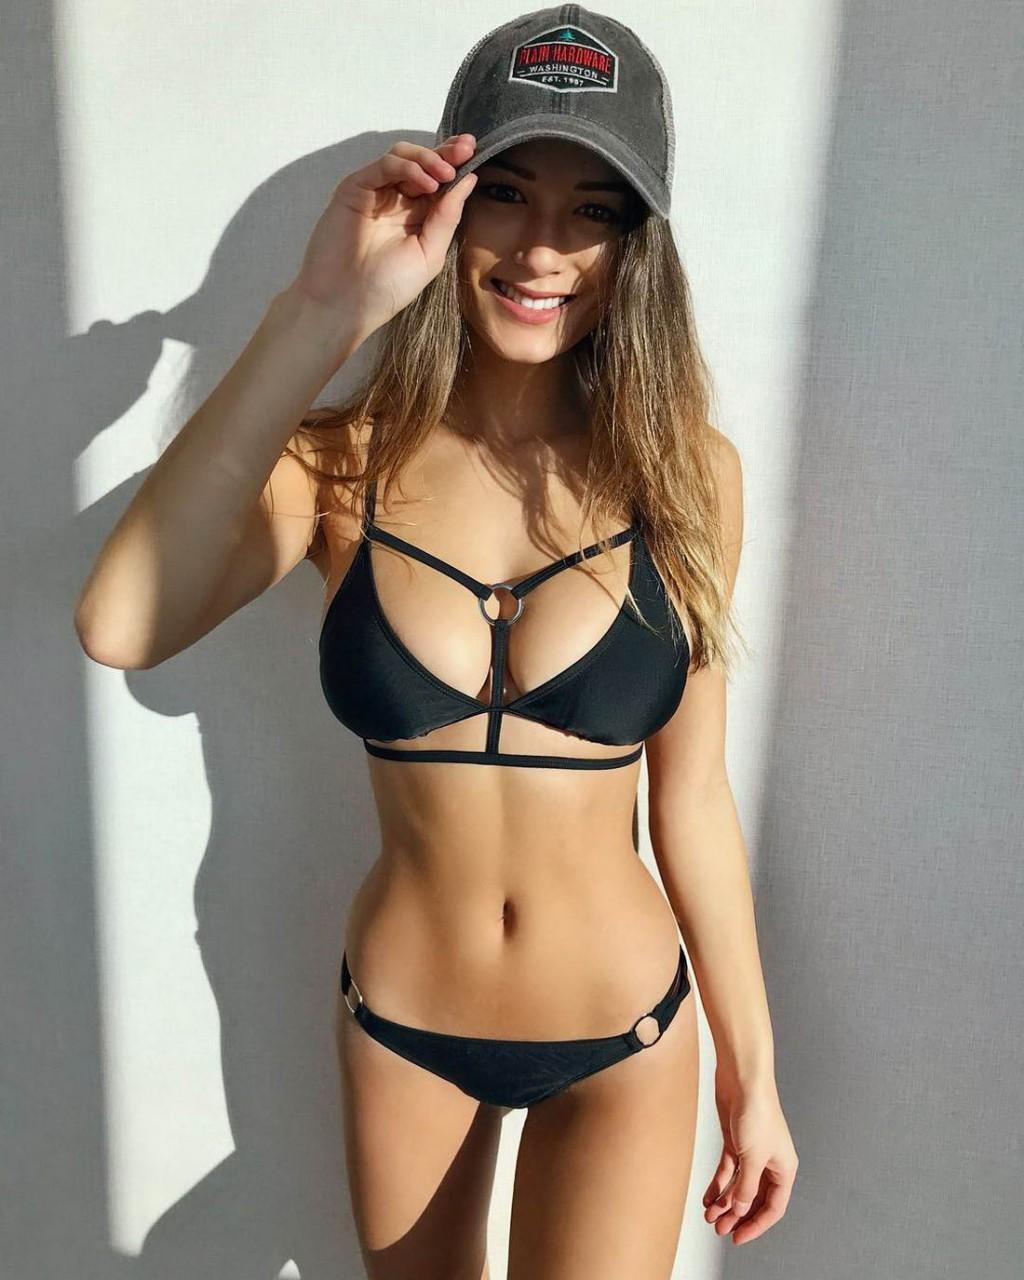 bikini-i-belaya-kepka-foto-porno